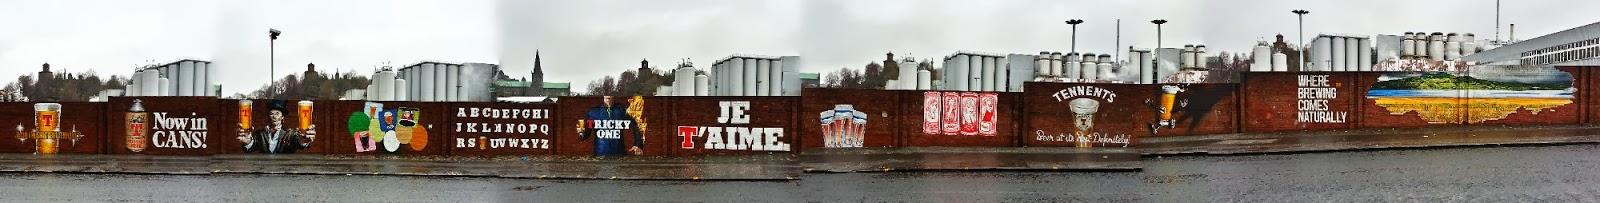 Wellpark Brewery mural, Glasgow